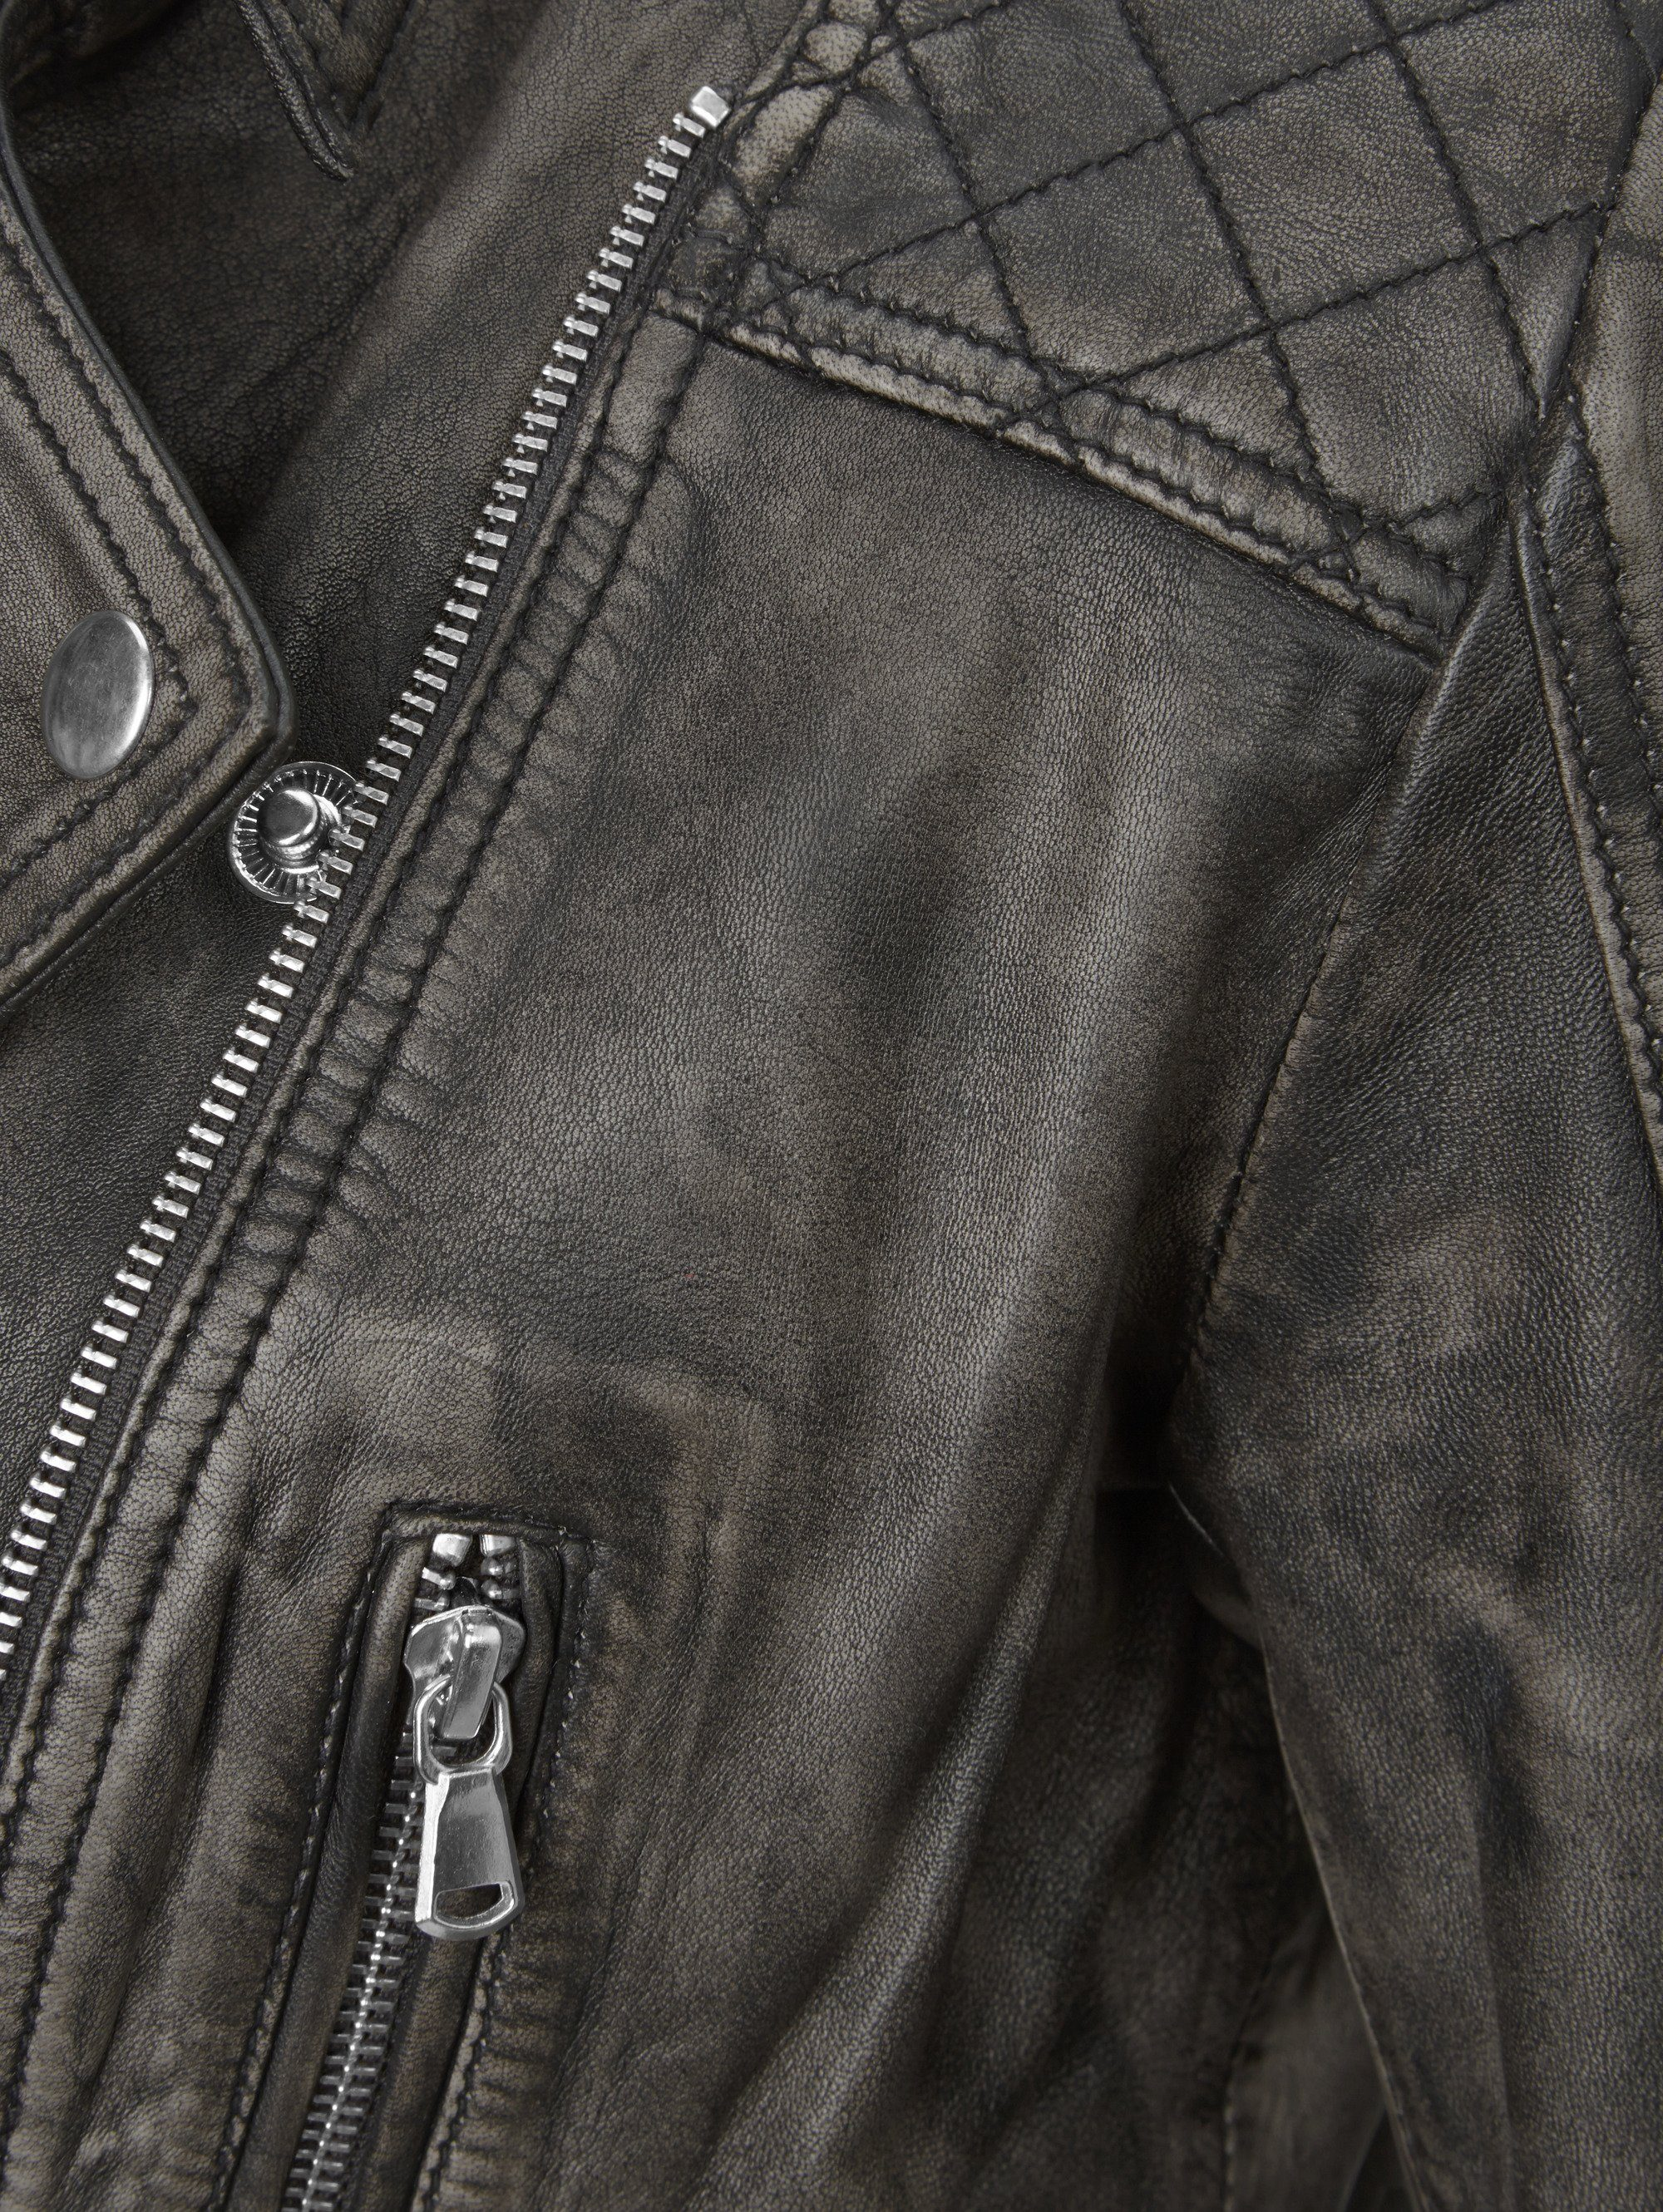 Rockgewitter Lederjacke im Biker Style für Damen | Jacken